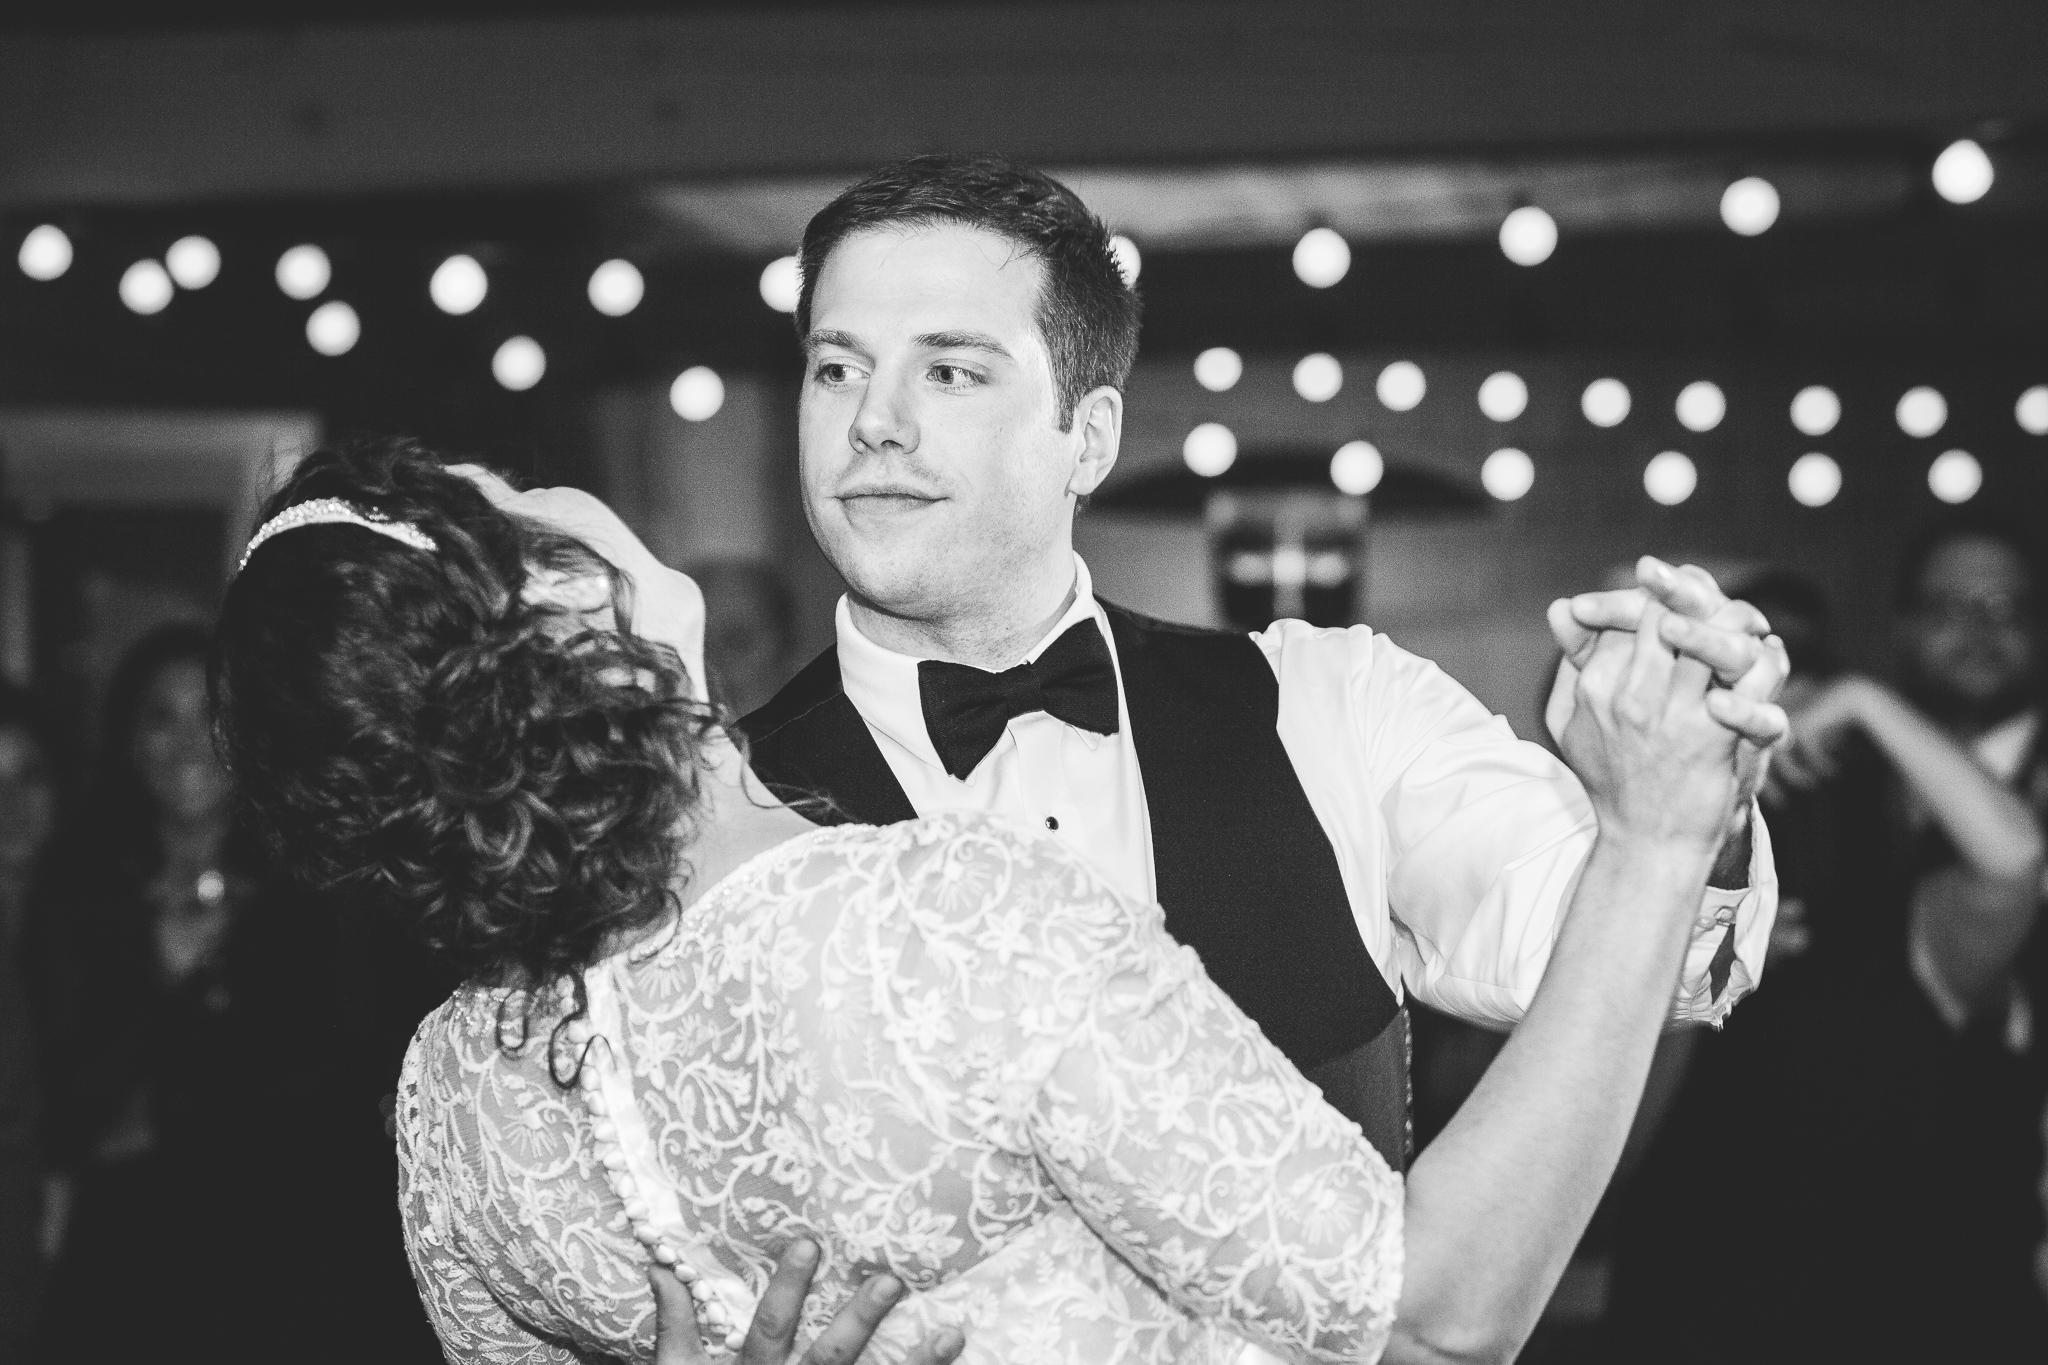 camuglia-whomstudio-chelsea_and_andy-nycphotographer-wedding-brooklyn-buffalo-timberlodge-119-0759.jpg